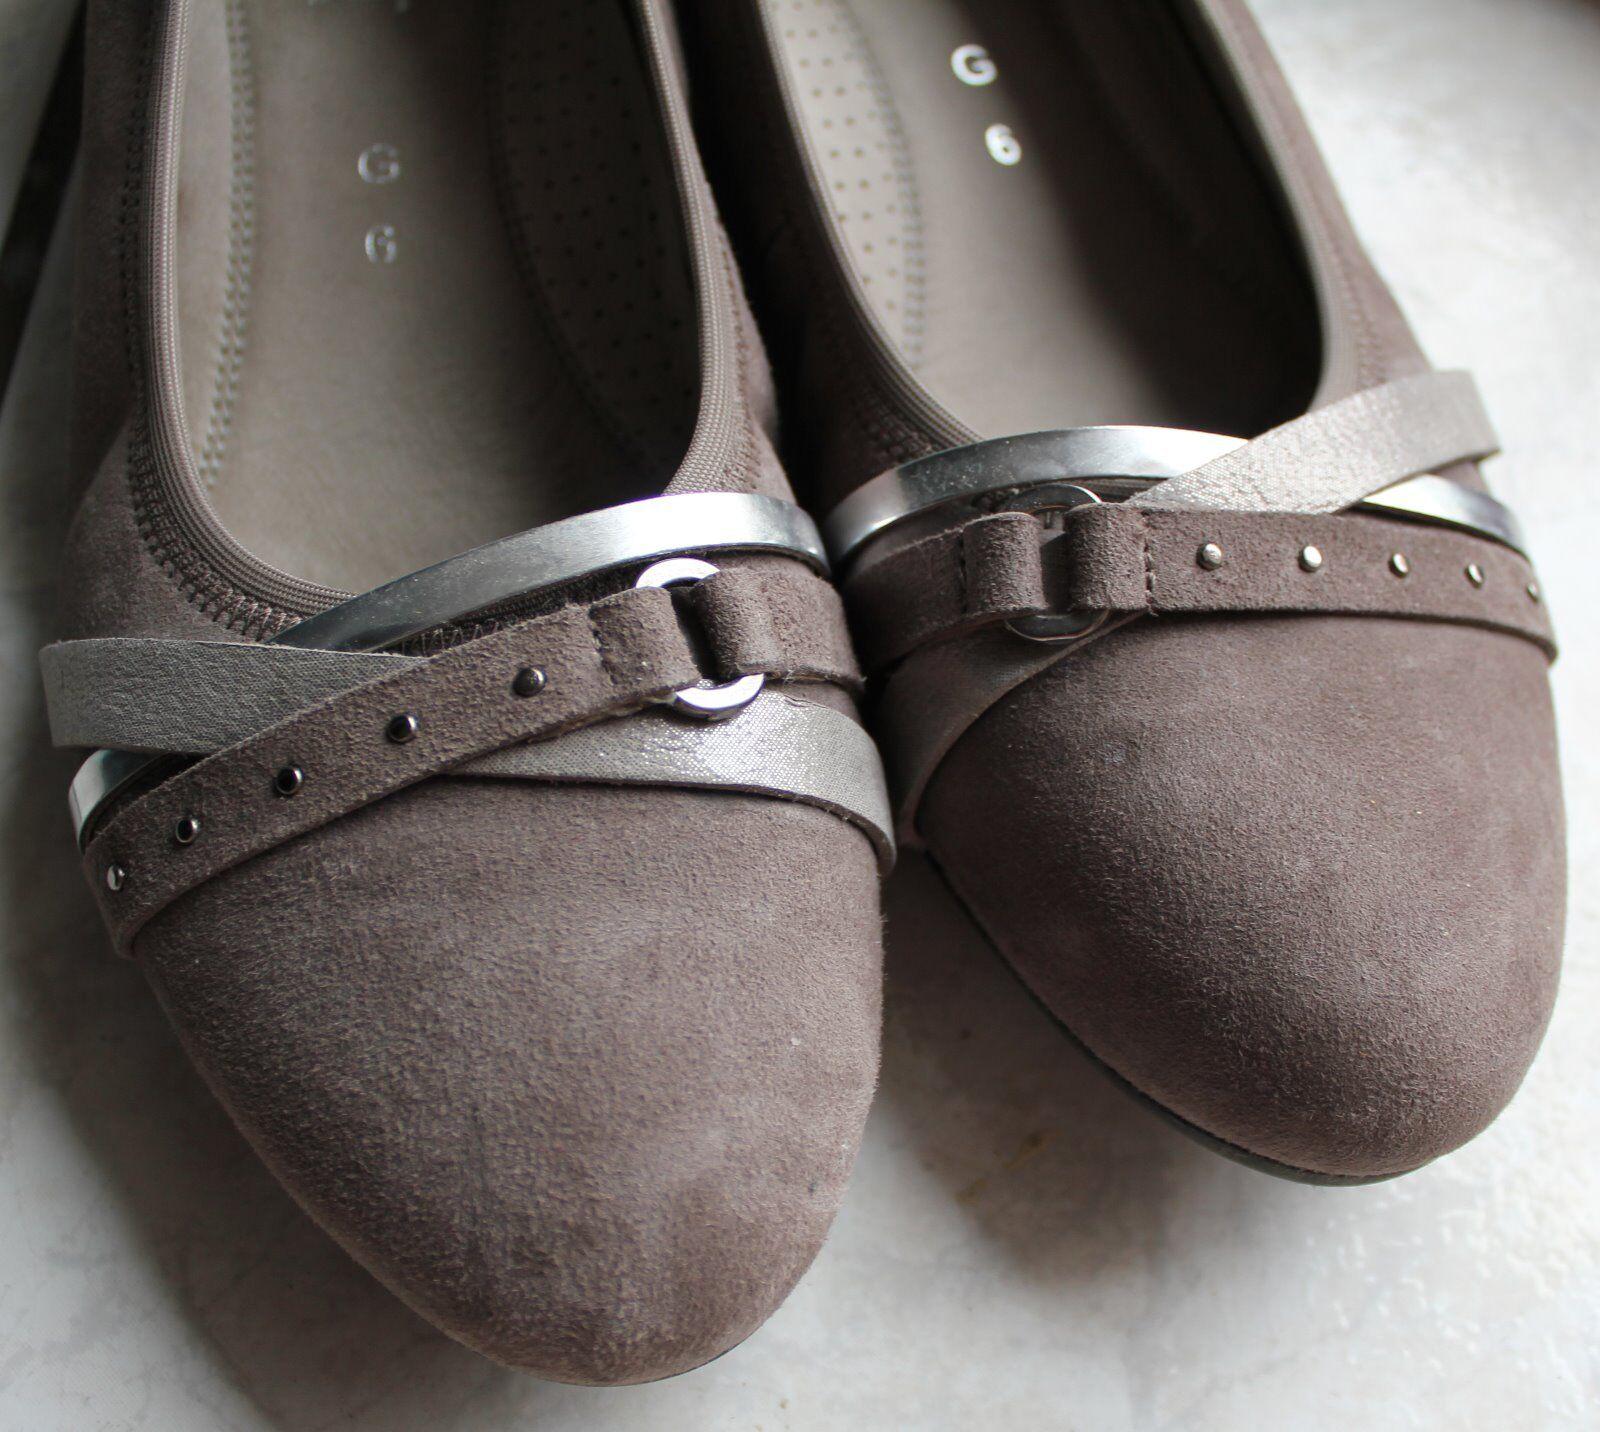 GABOR Comfort steel Damen-Ballerinas /Pumps,Nubuk-Leder,Samtchevreau, steel Comfort Gr. 6 (39) 31b728